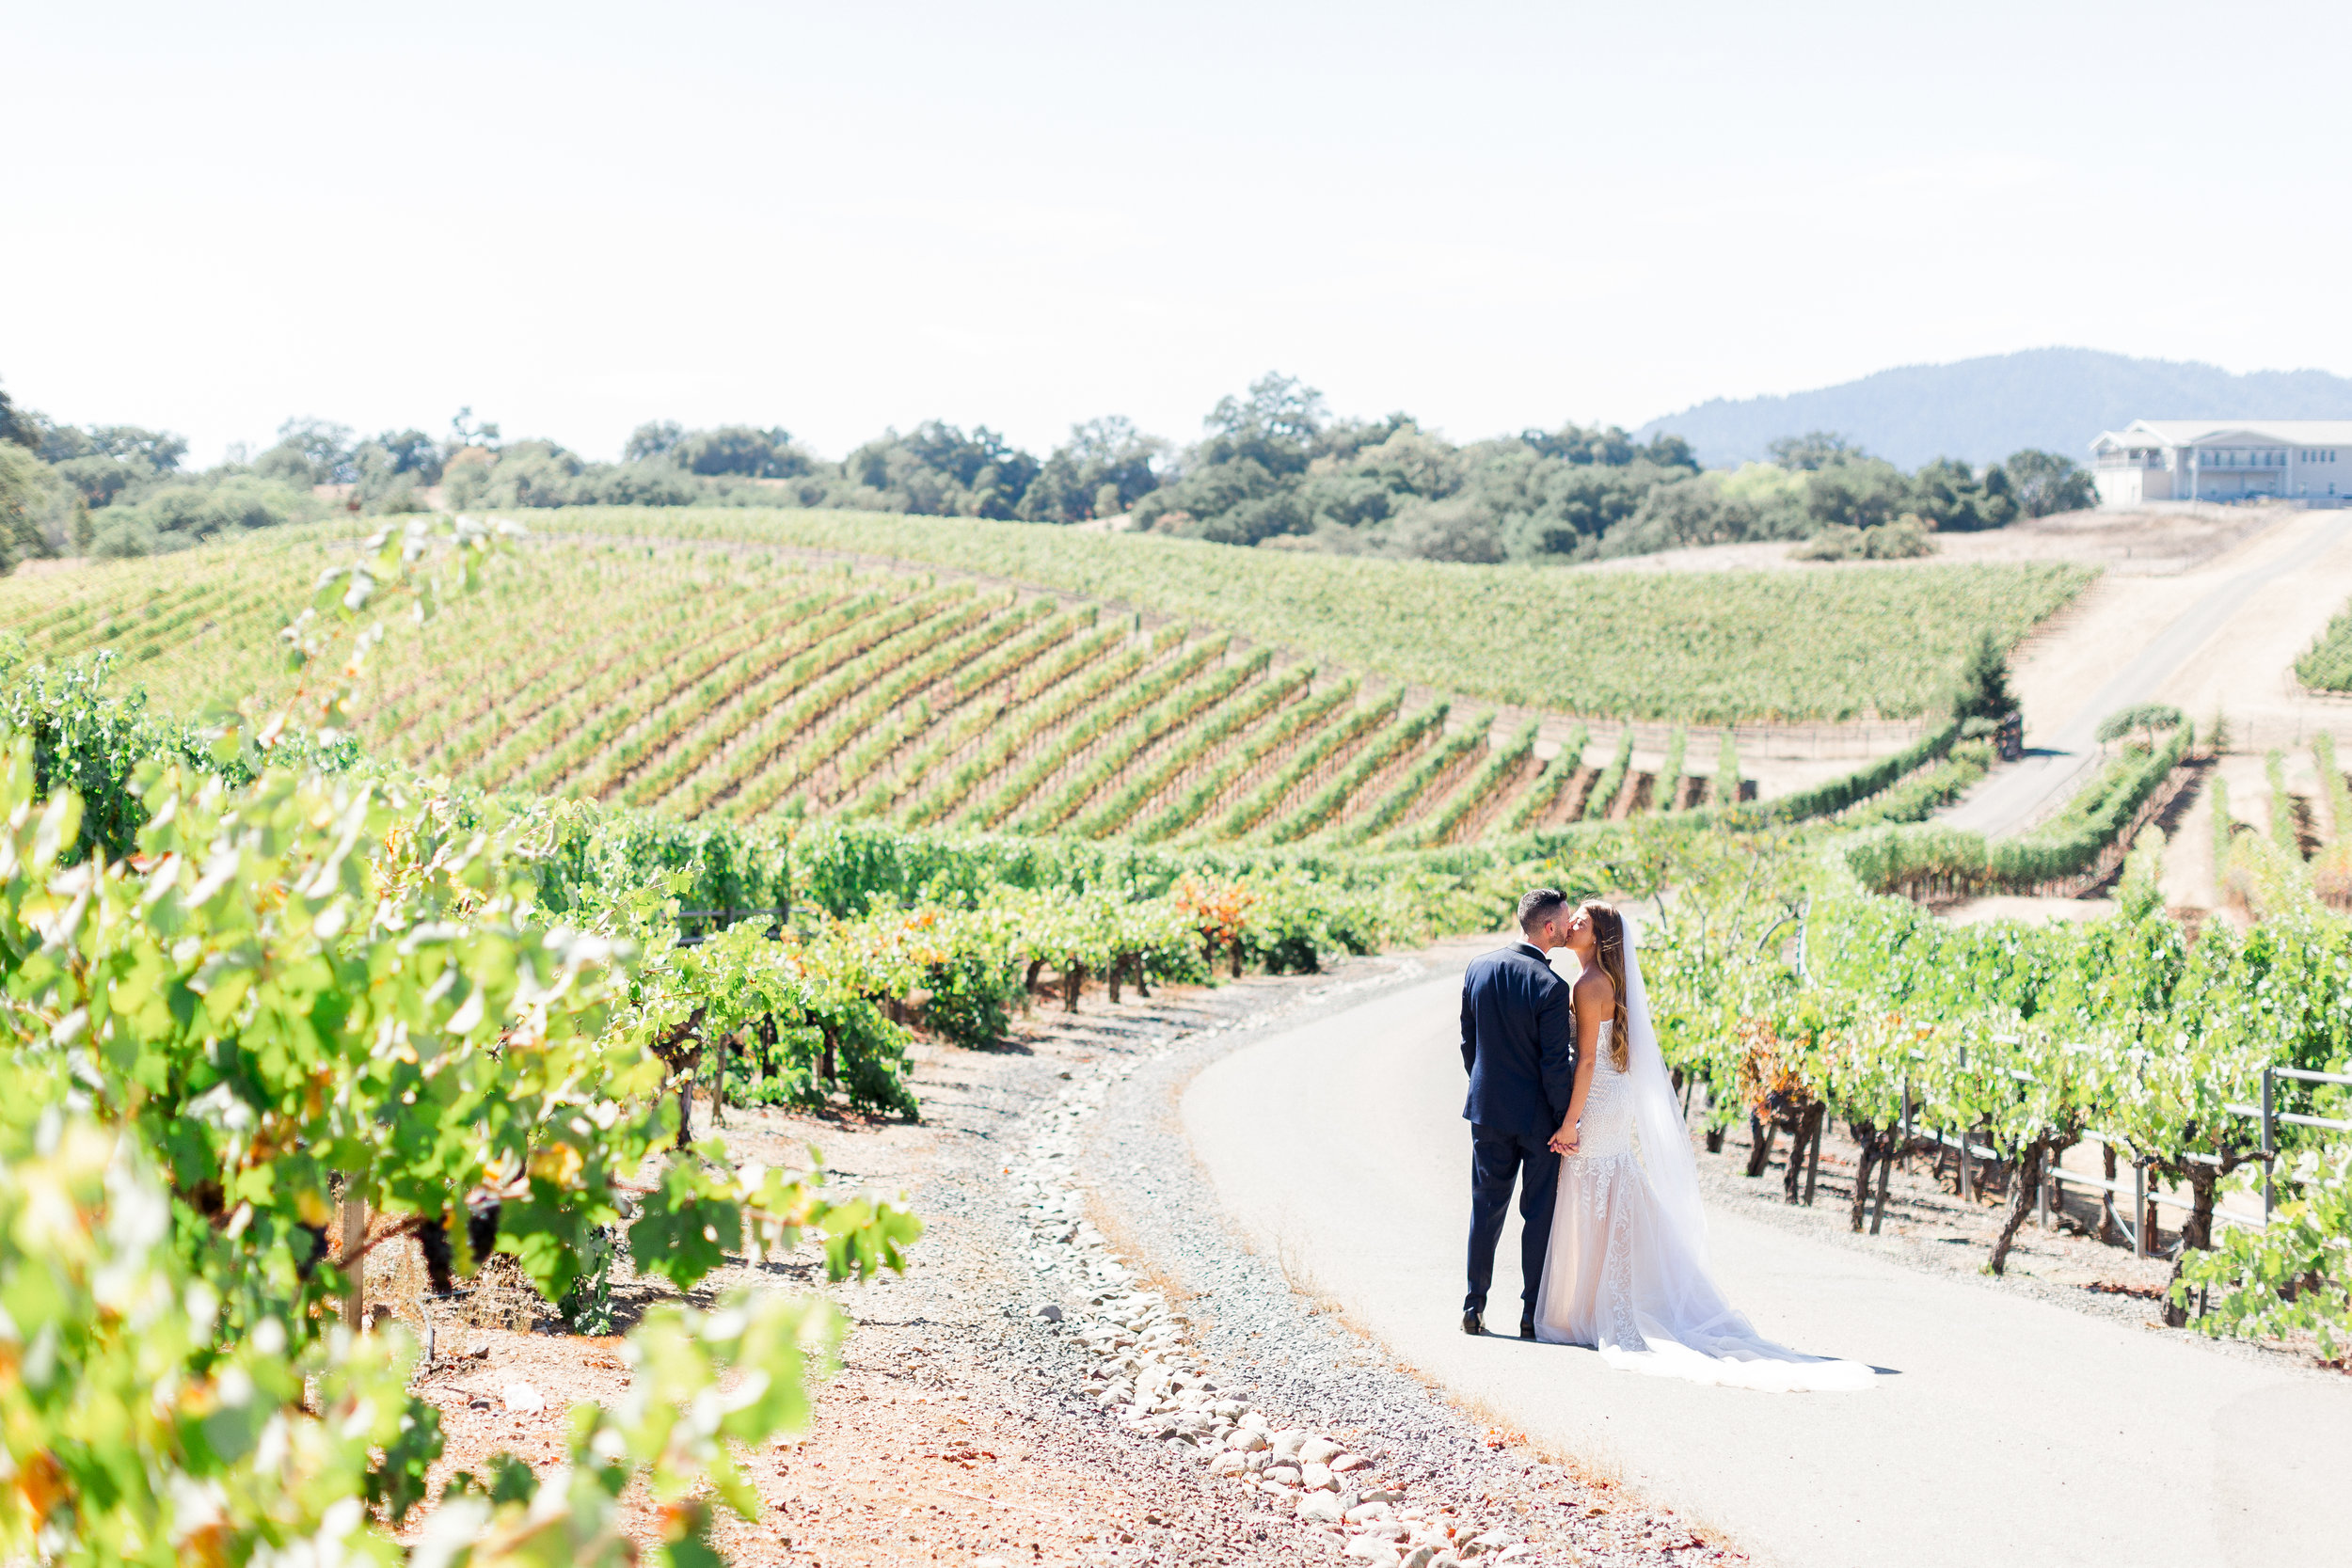 Calegari-Vineyard-Healdsburg-Wedding-Photographer-2.jpg